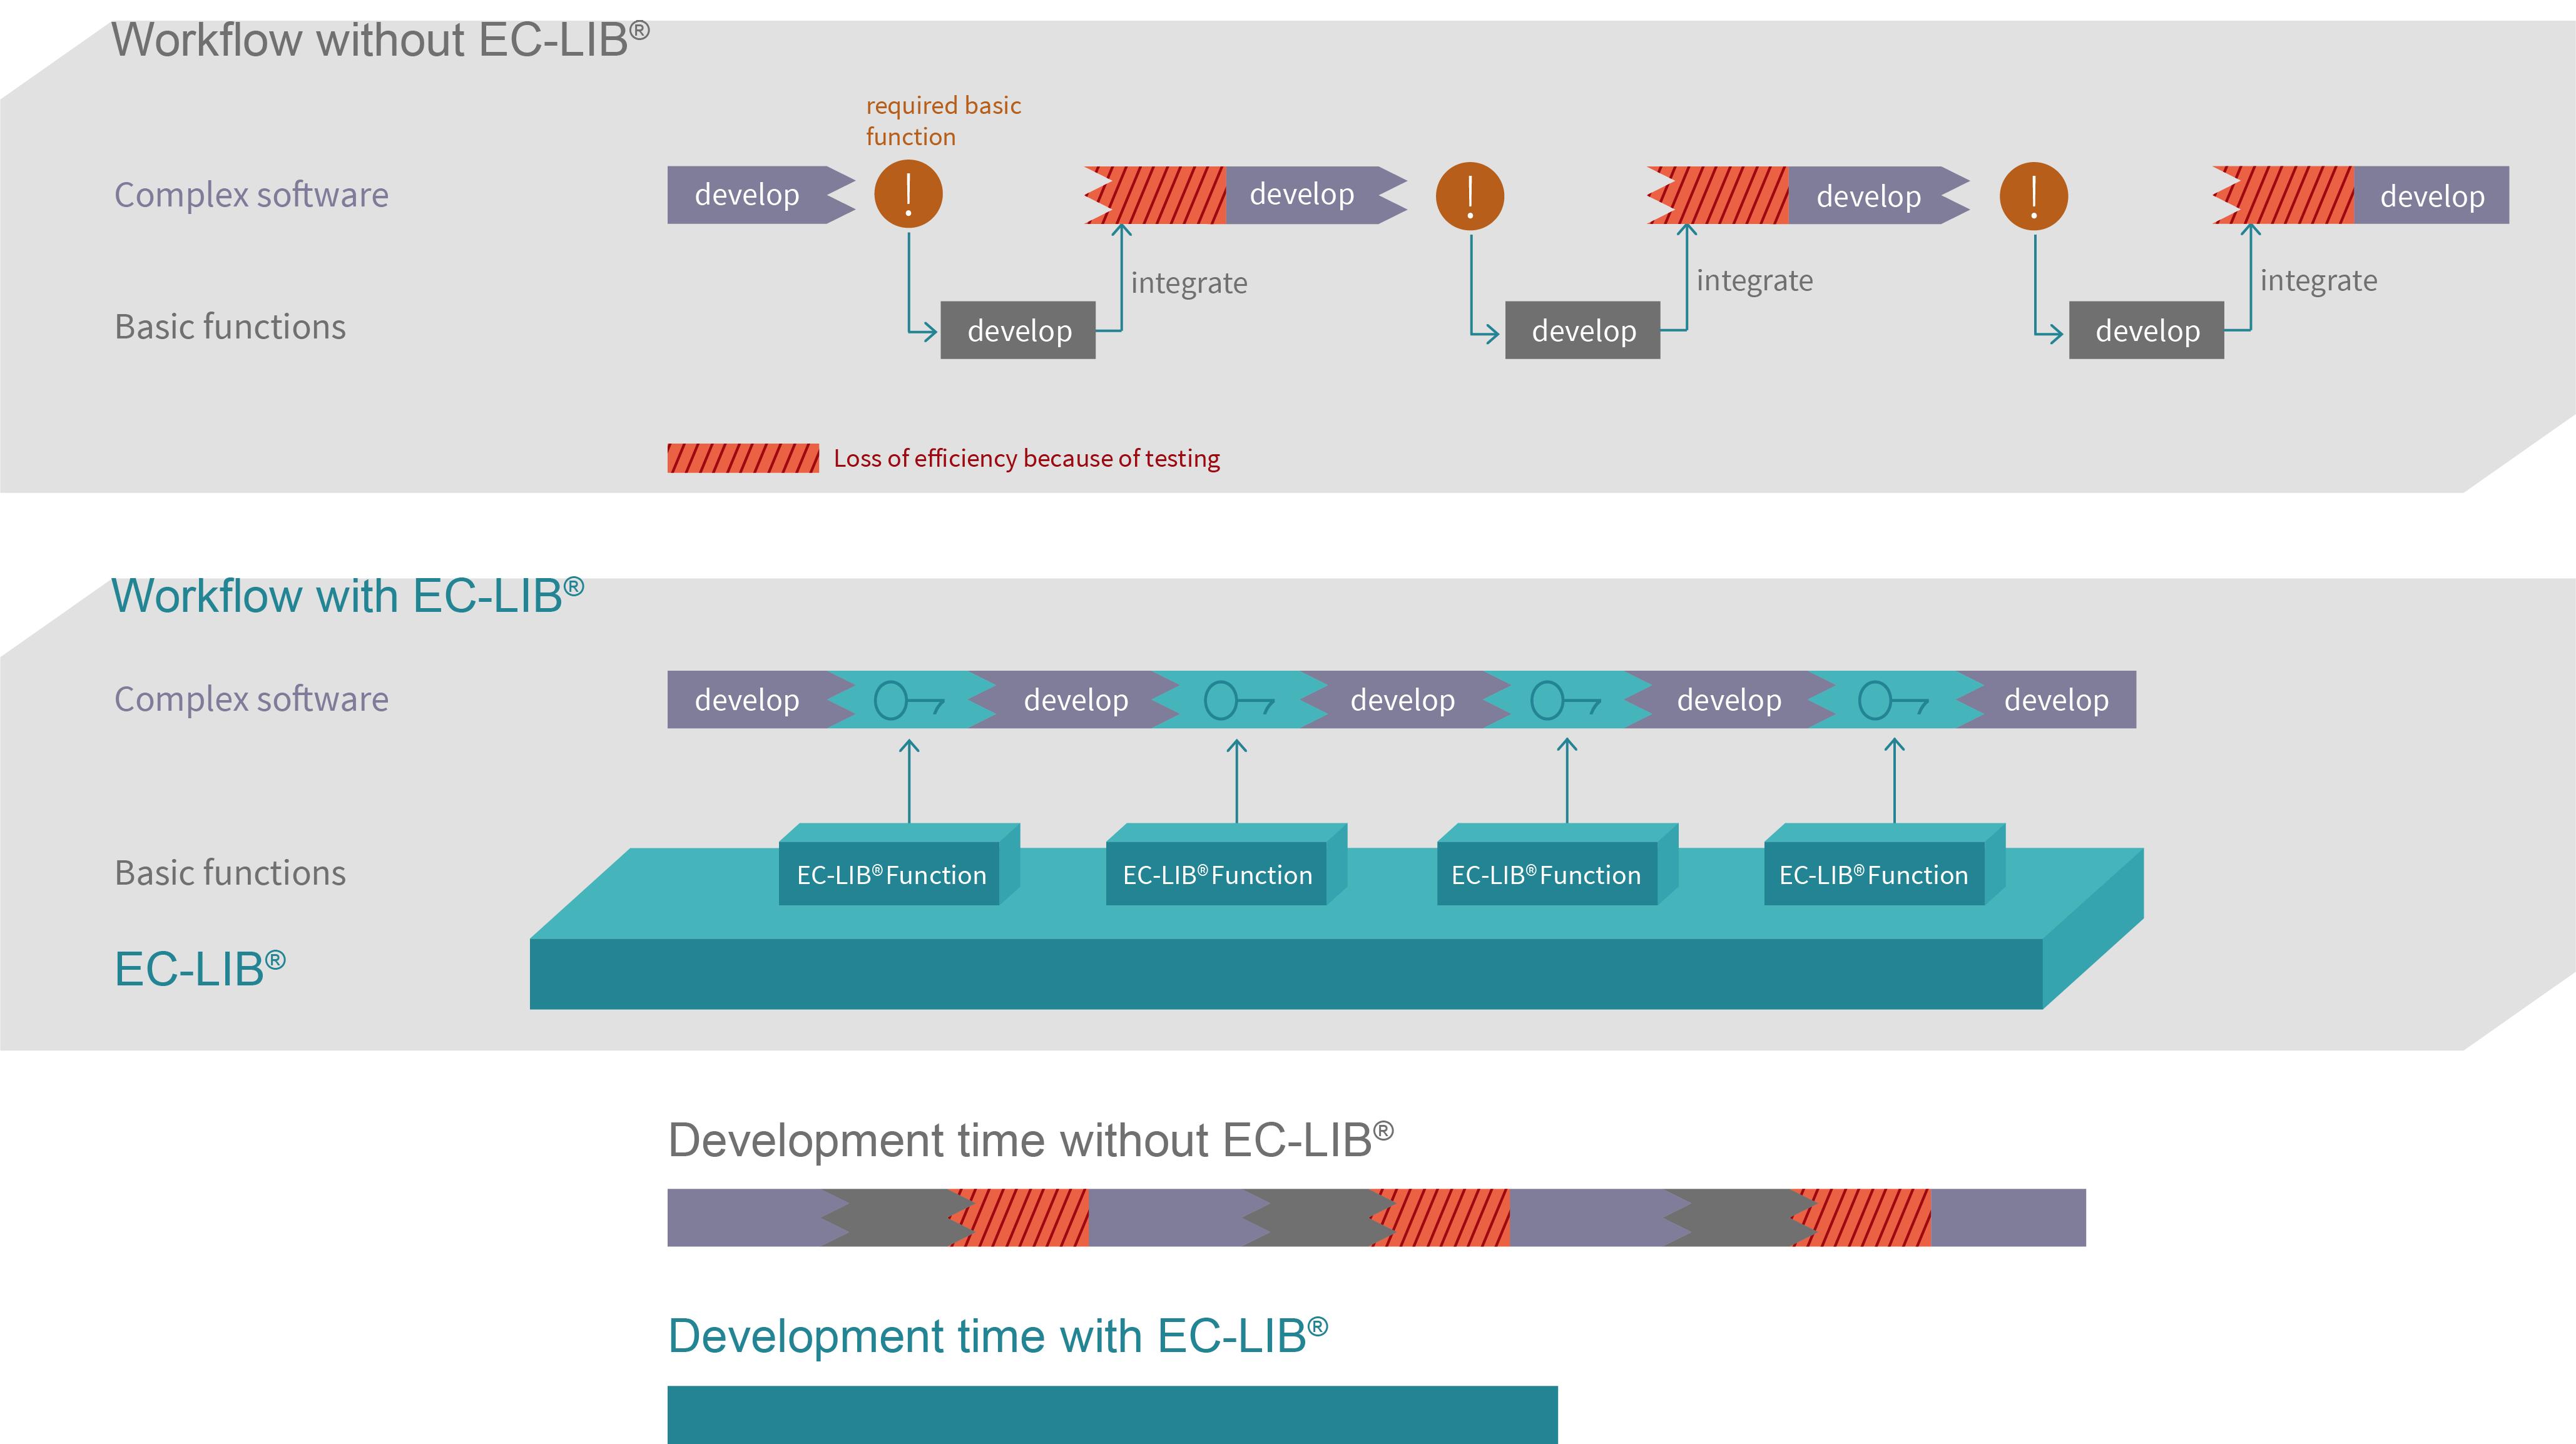 Software Development Workflow With EC-LIB®